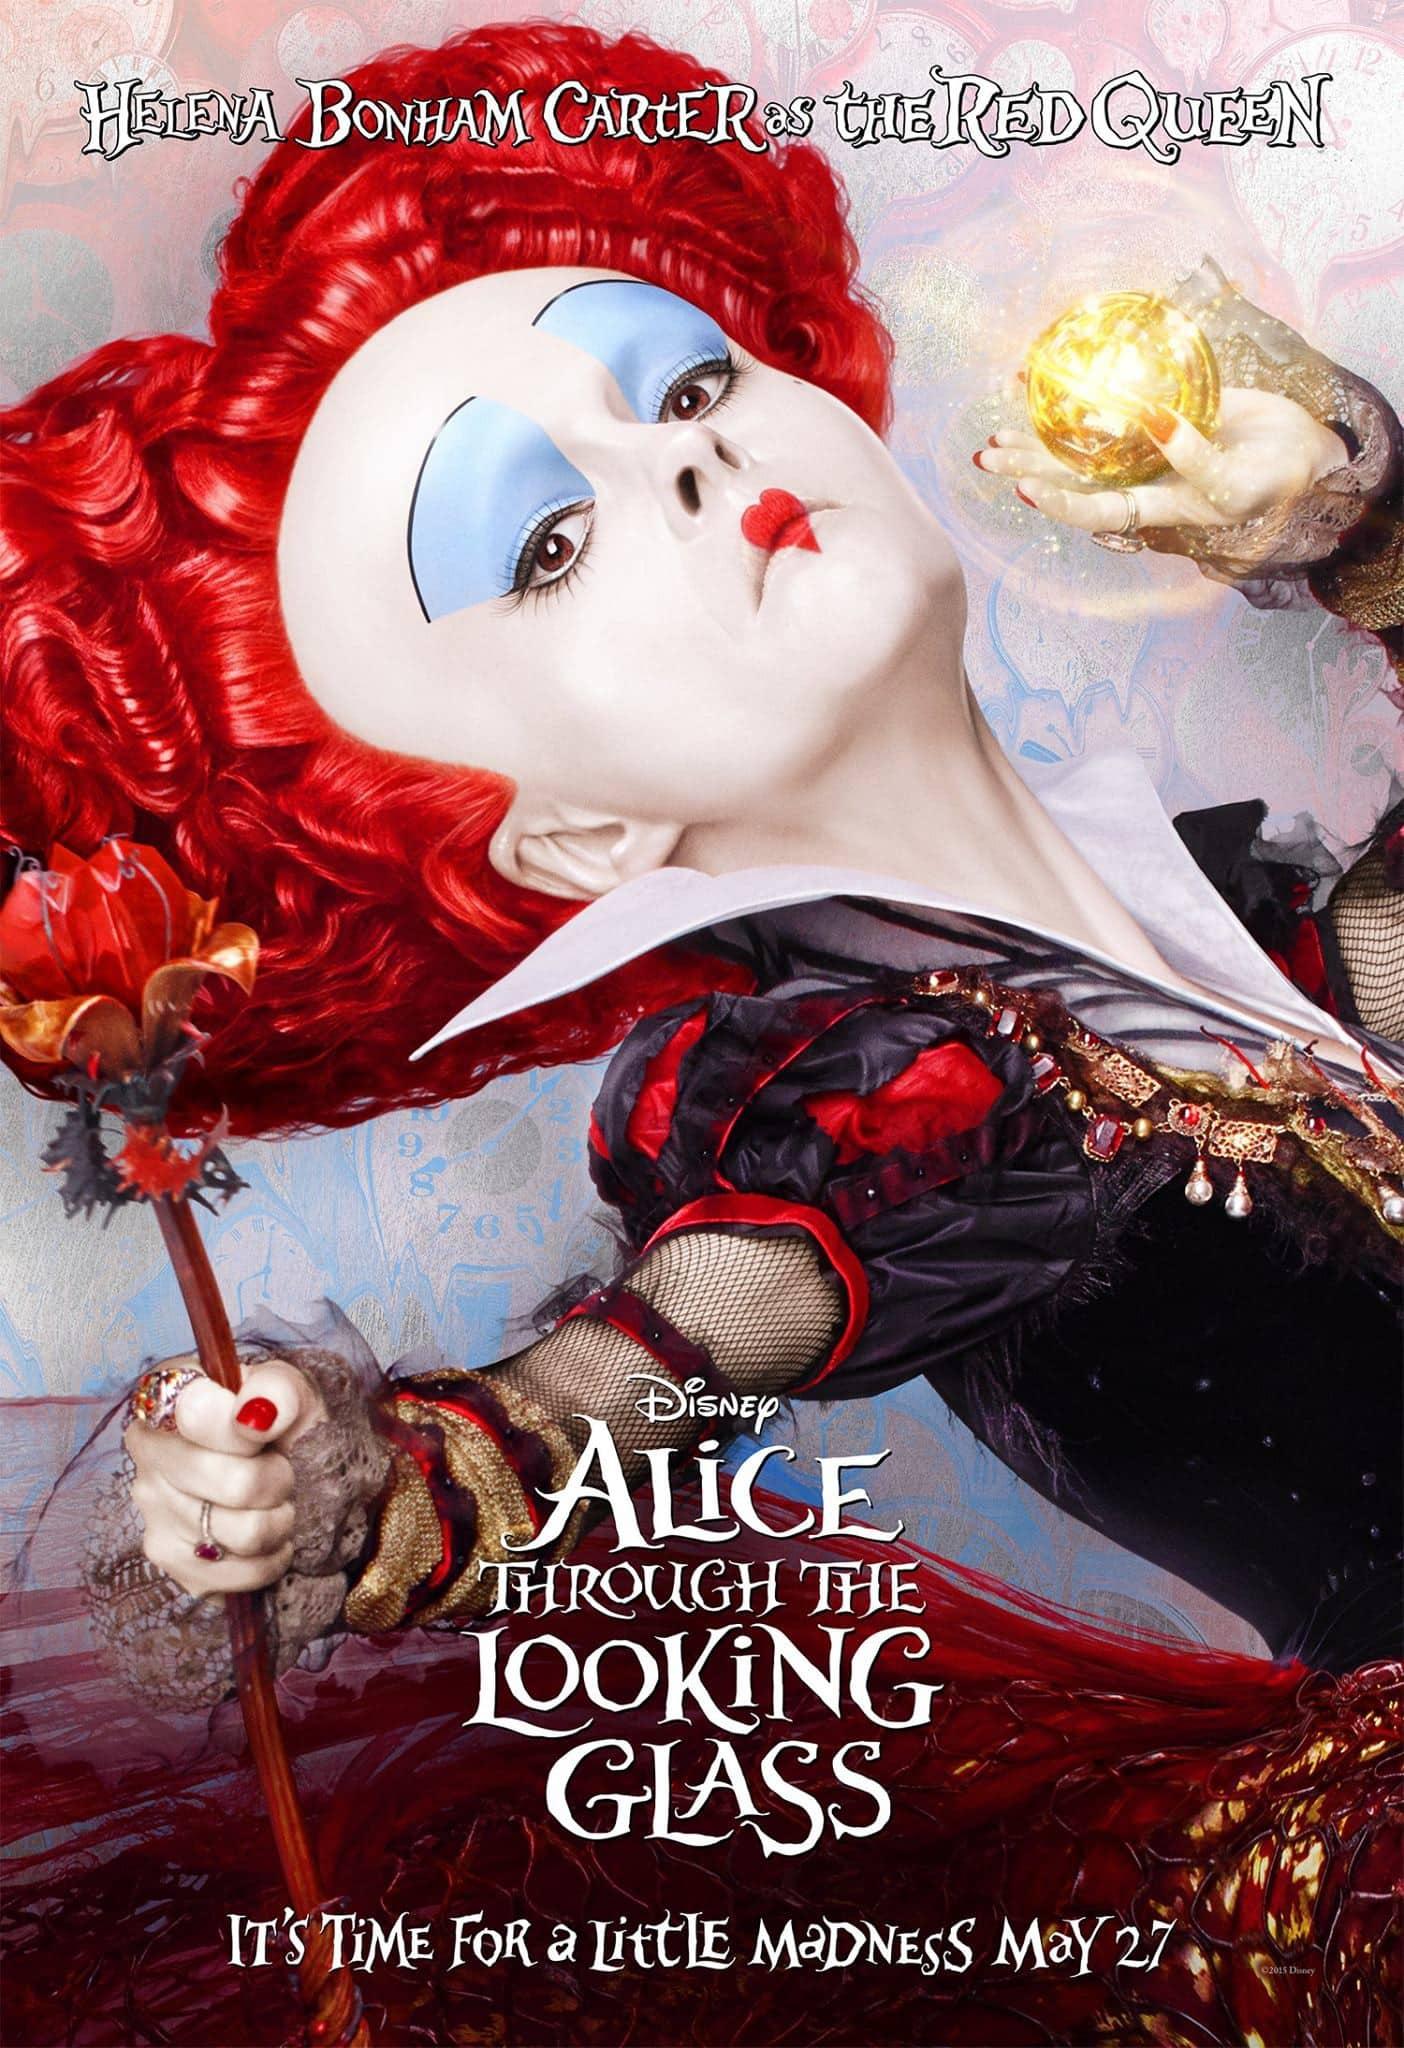 Helena Bonham Carter regresa a Alice Through the Looking Glass como la reina roja